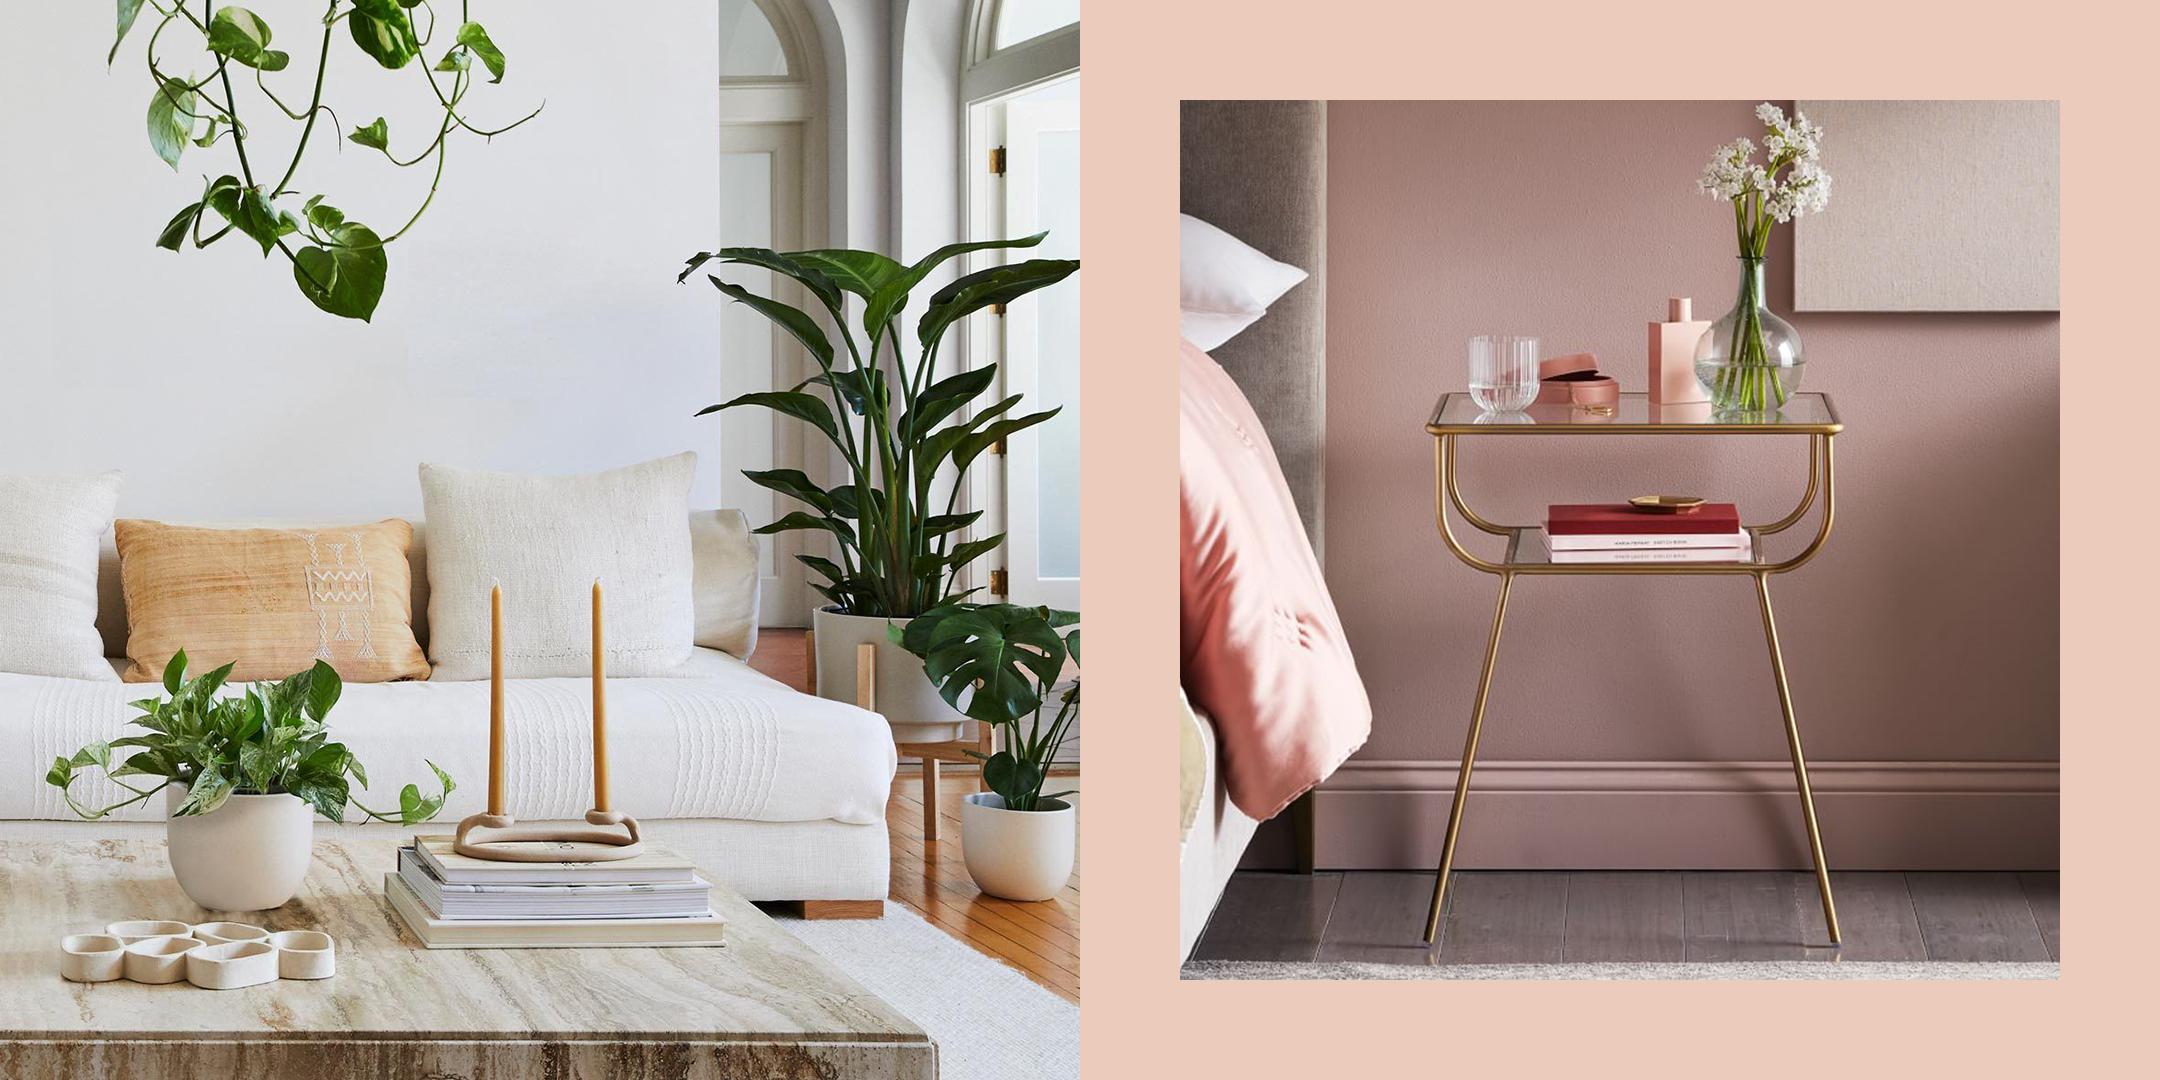 32 Easy Ways to Freshen Room 32 — Pretty Aesthetic Room Ideas